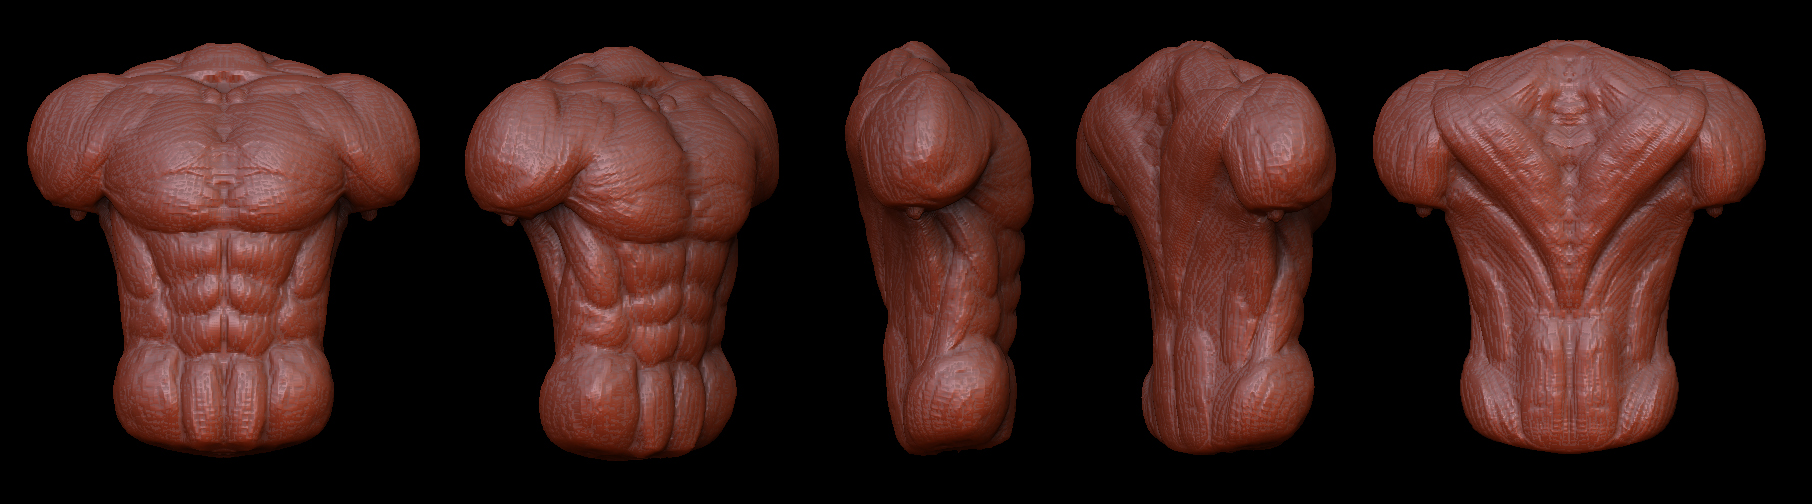 Zbrush Torso Muscle Study By Sentimentalfreak On Deviantart